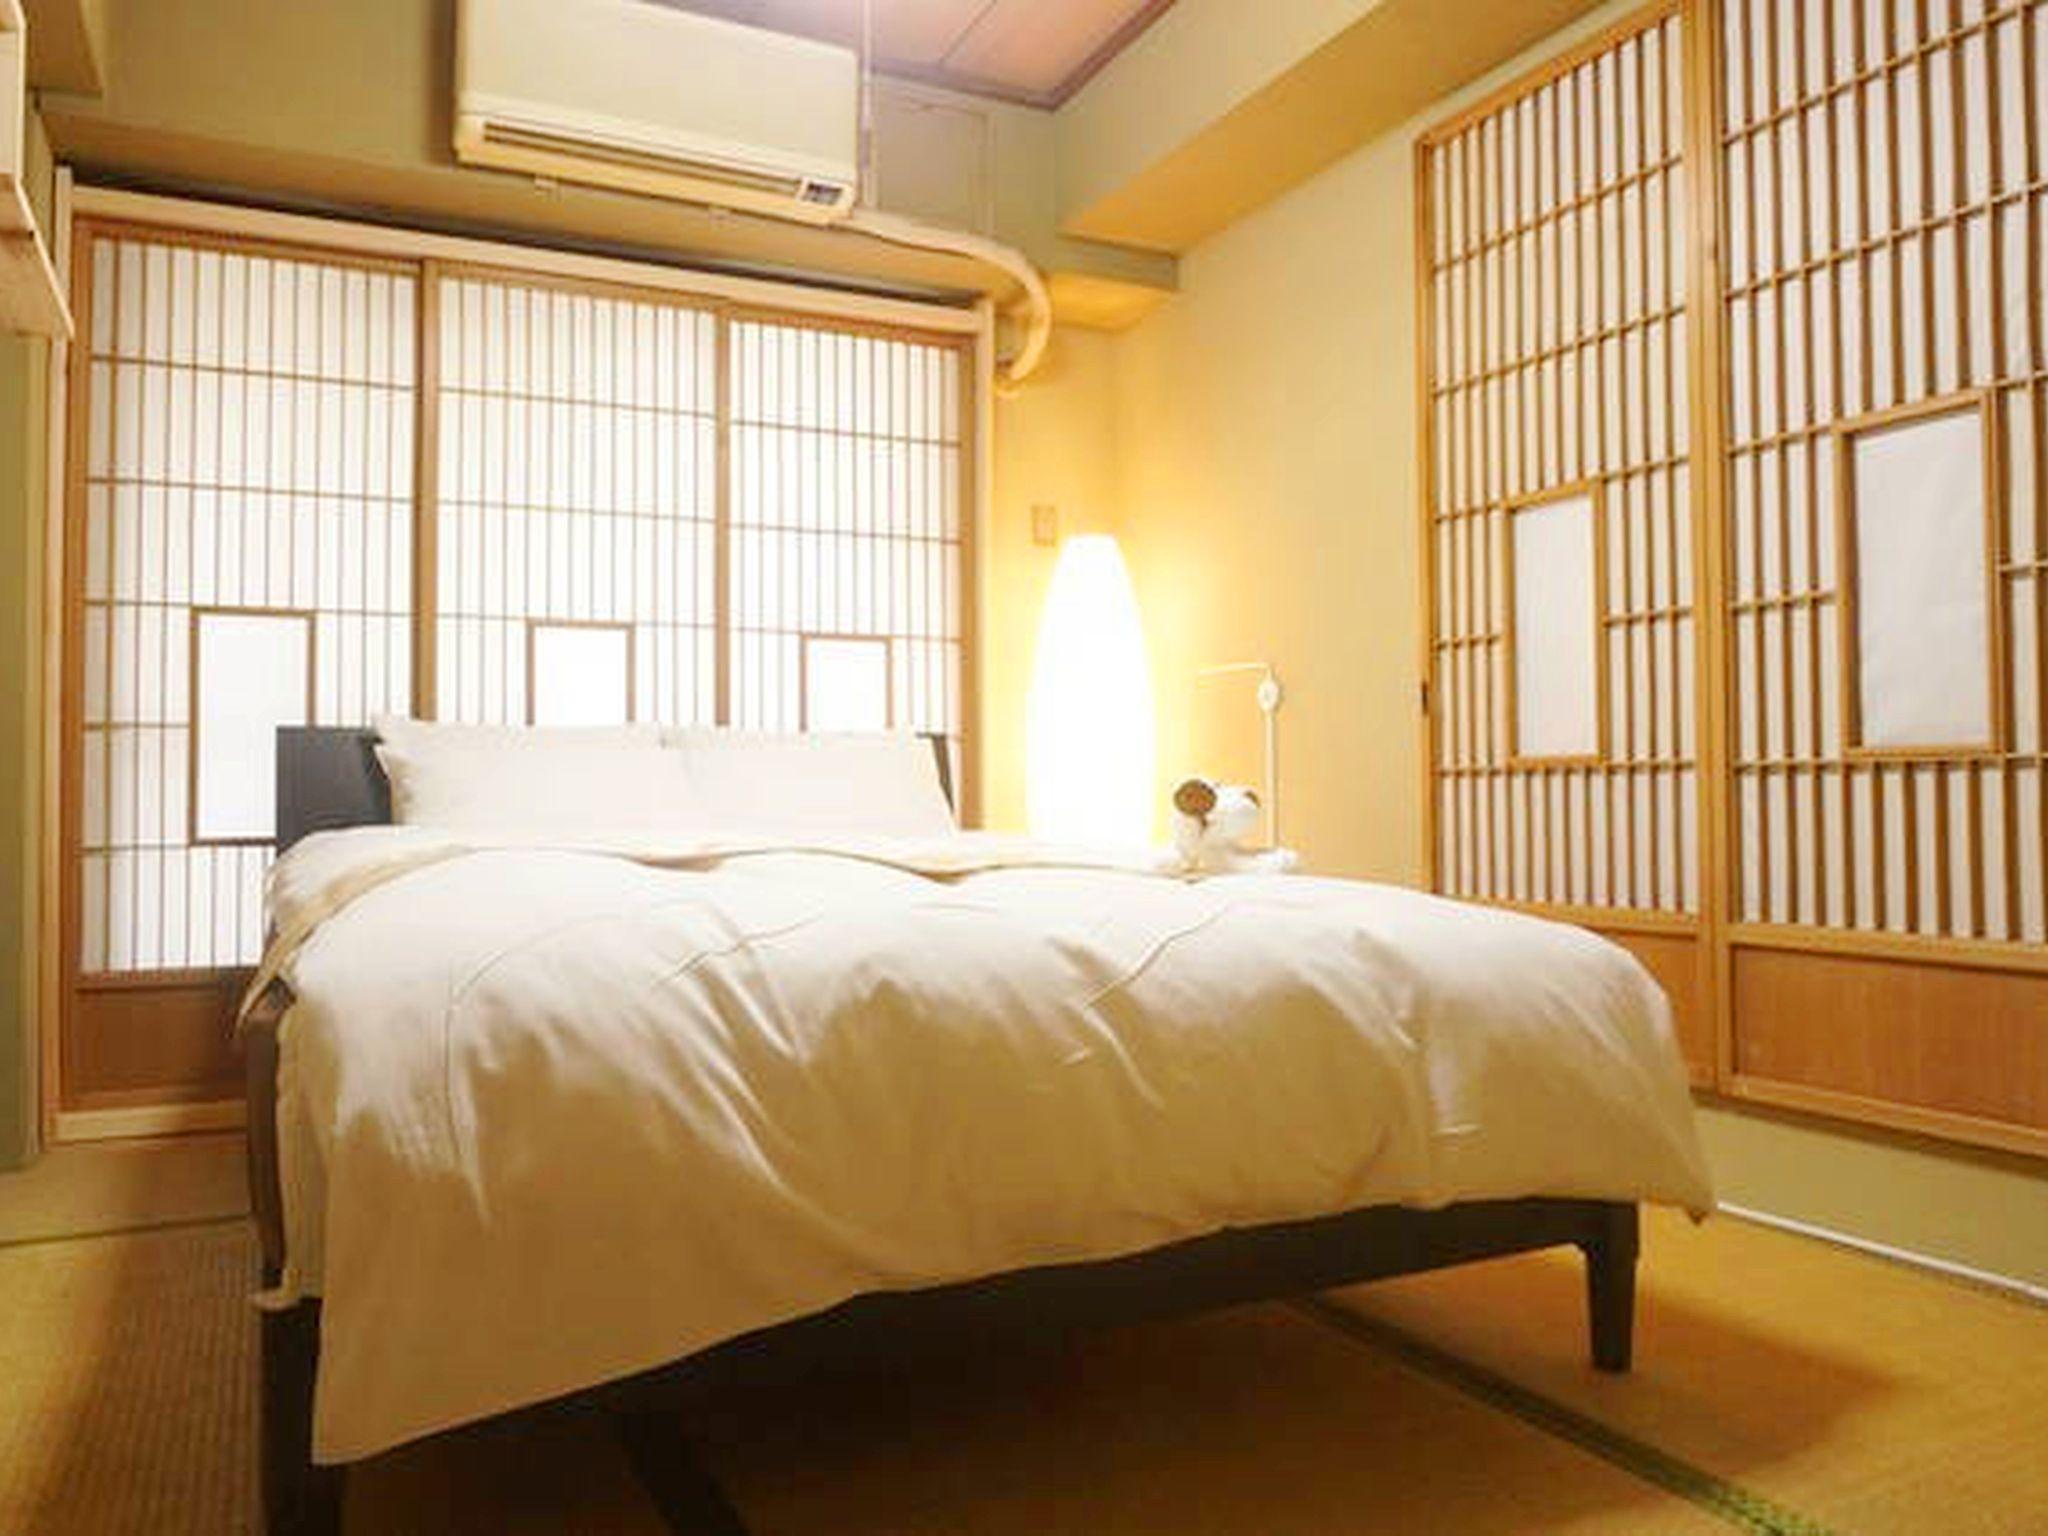 Kokoro House 1 Bedroom Apartment In Nippori J2 Properti